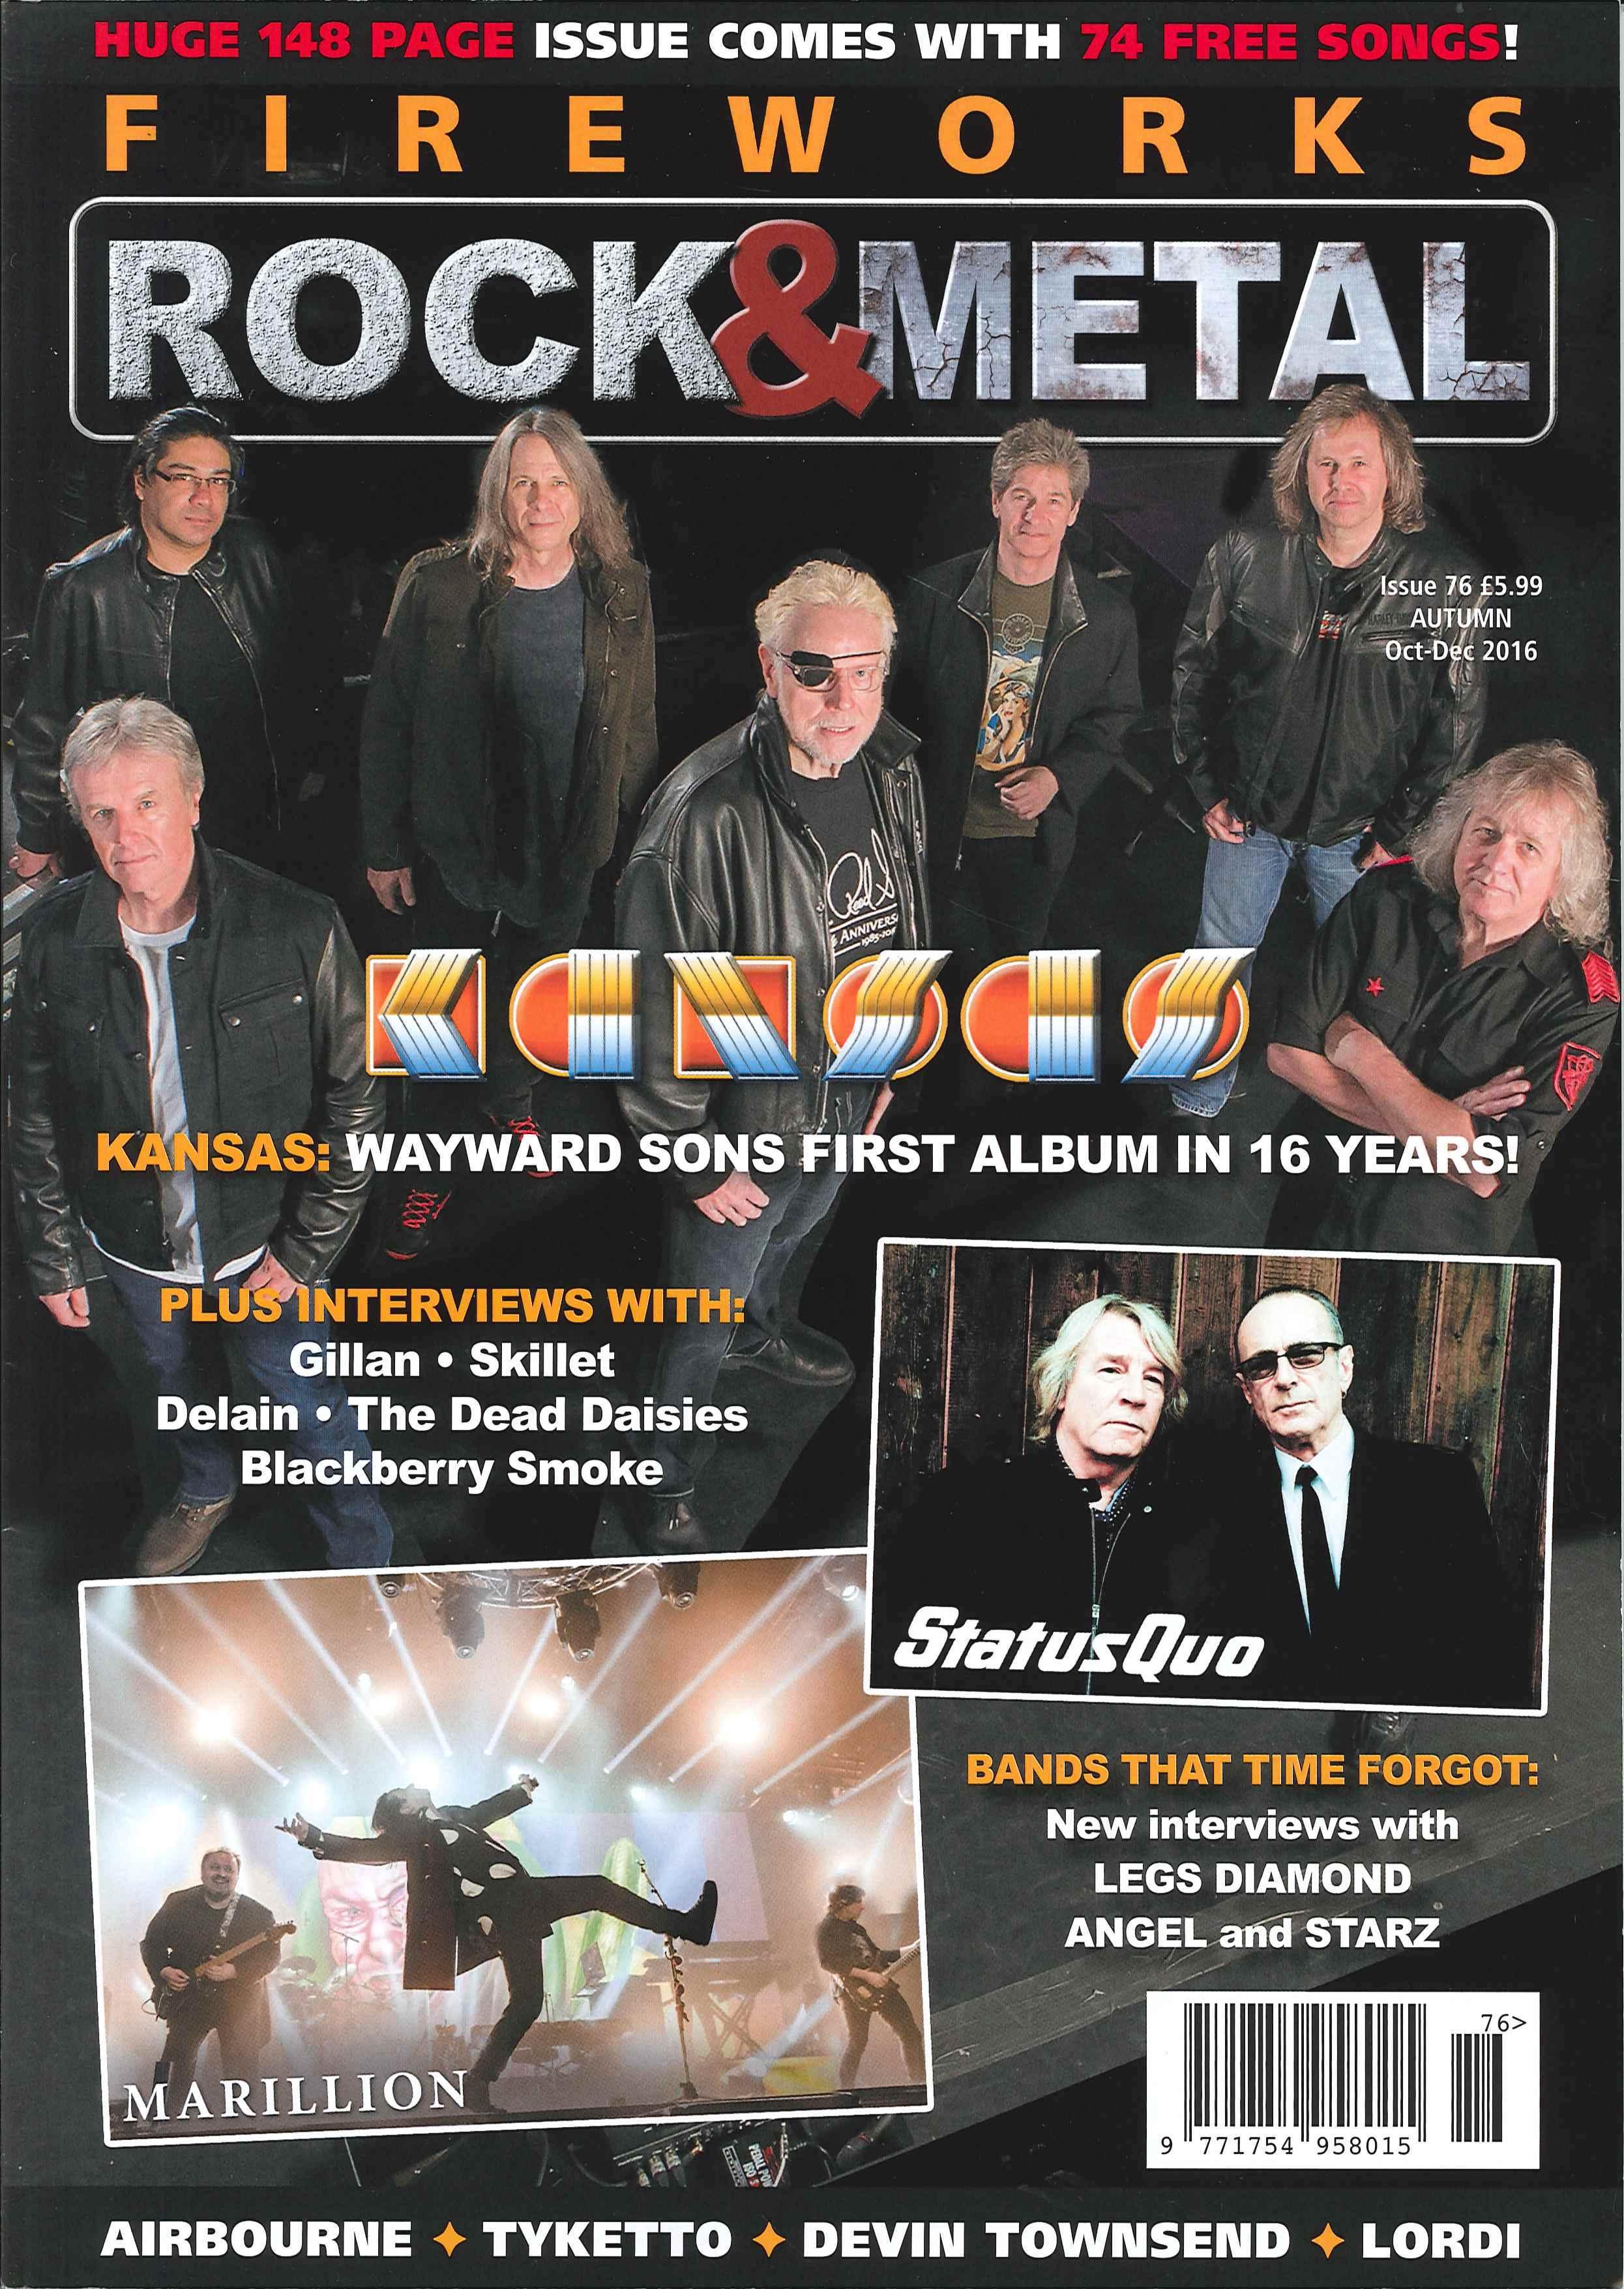 Fireworks Magazine_Oct Dec 2016_Sari Schorr_Album Review_1.jpg